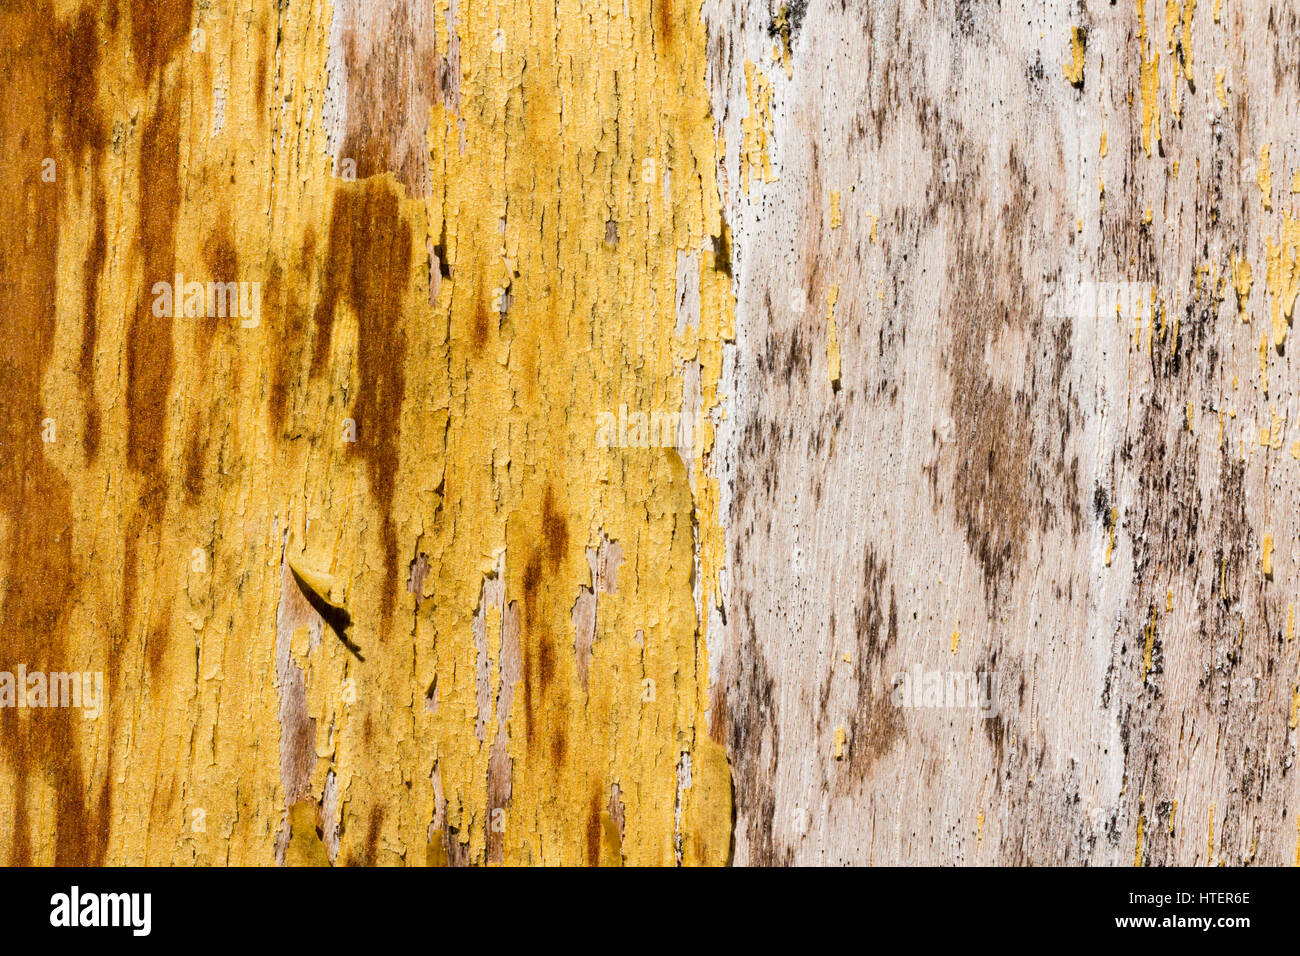 Decrepit yellow old wood background - Stock Image